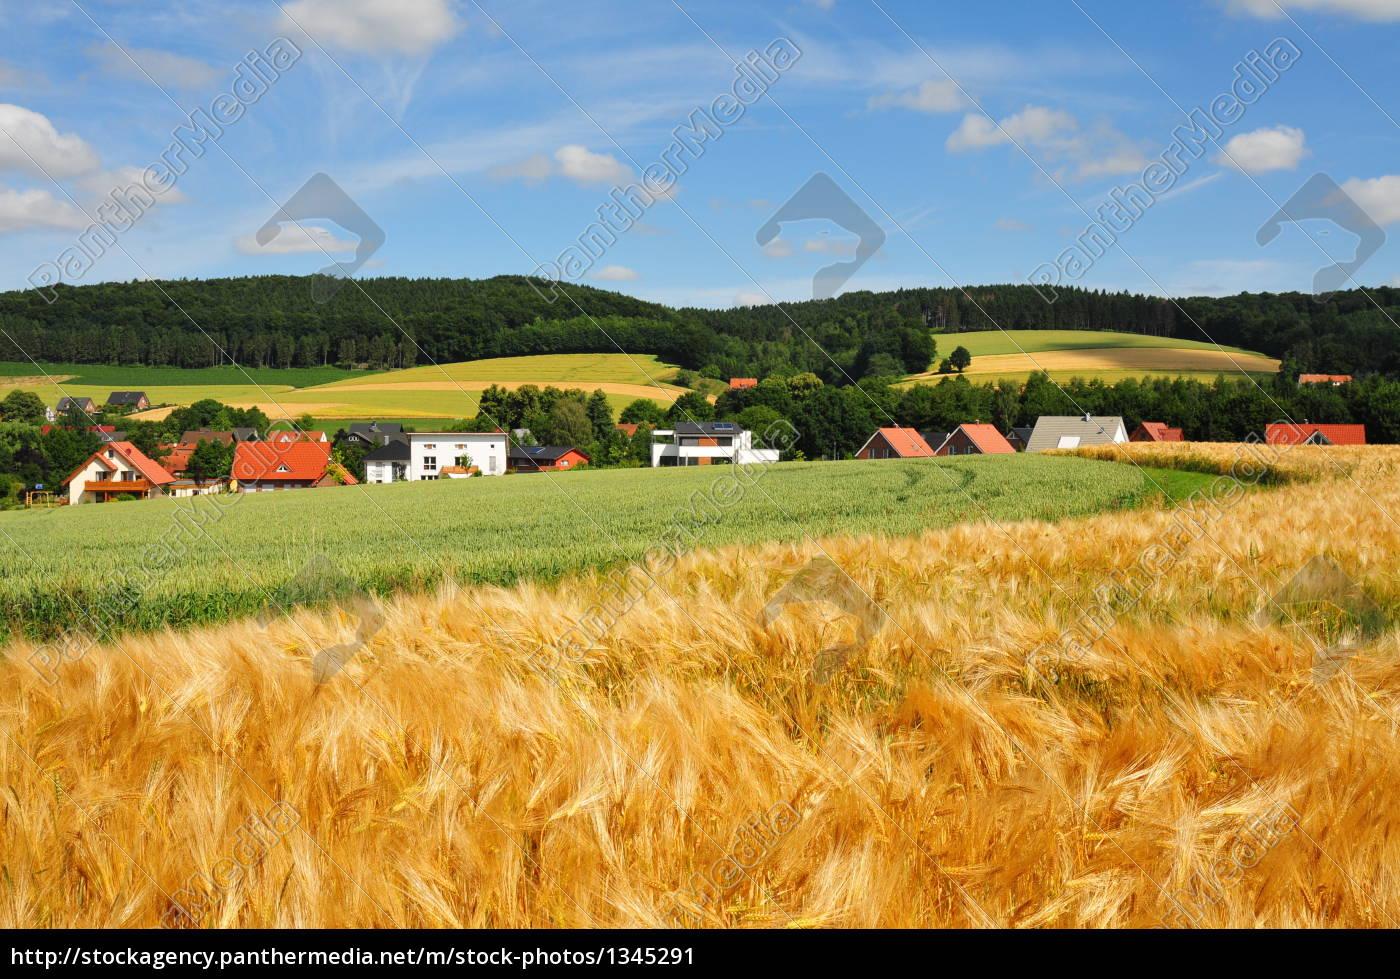 houses, in, tecklenburgerland - 1345291